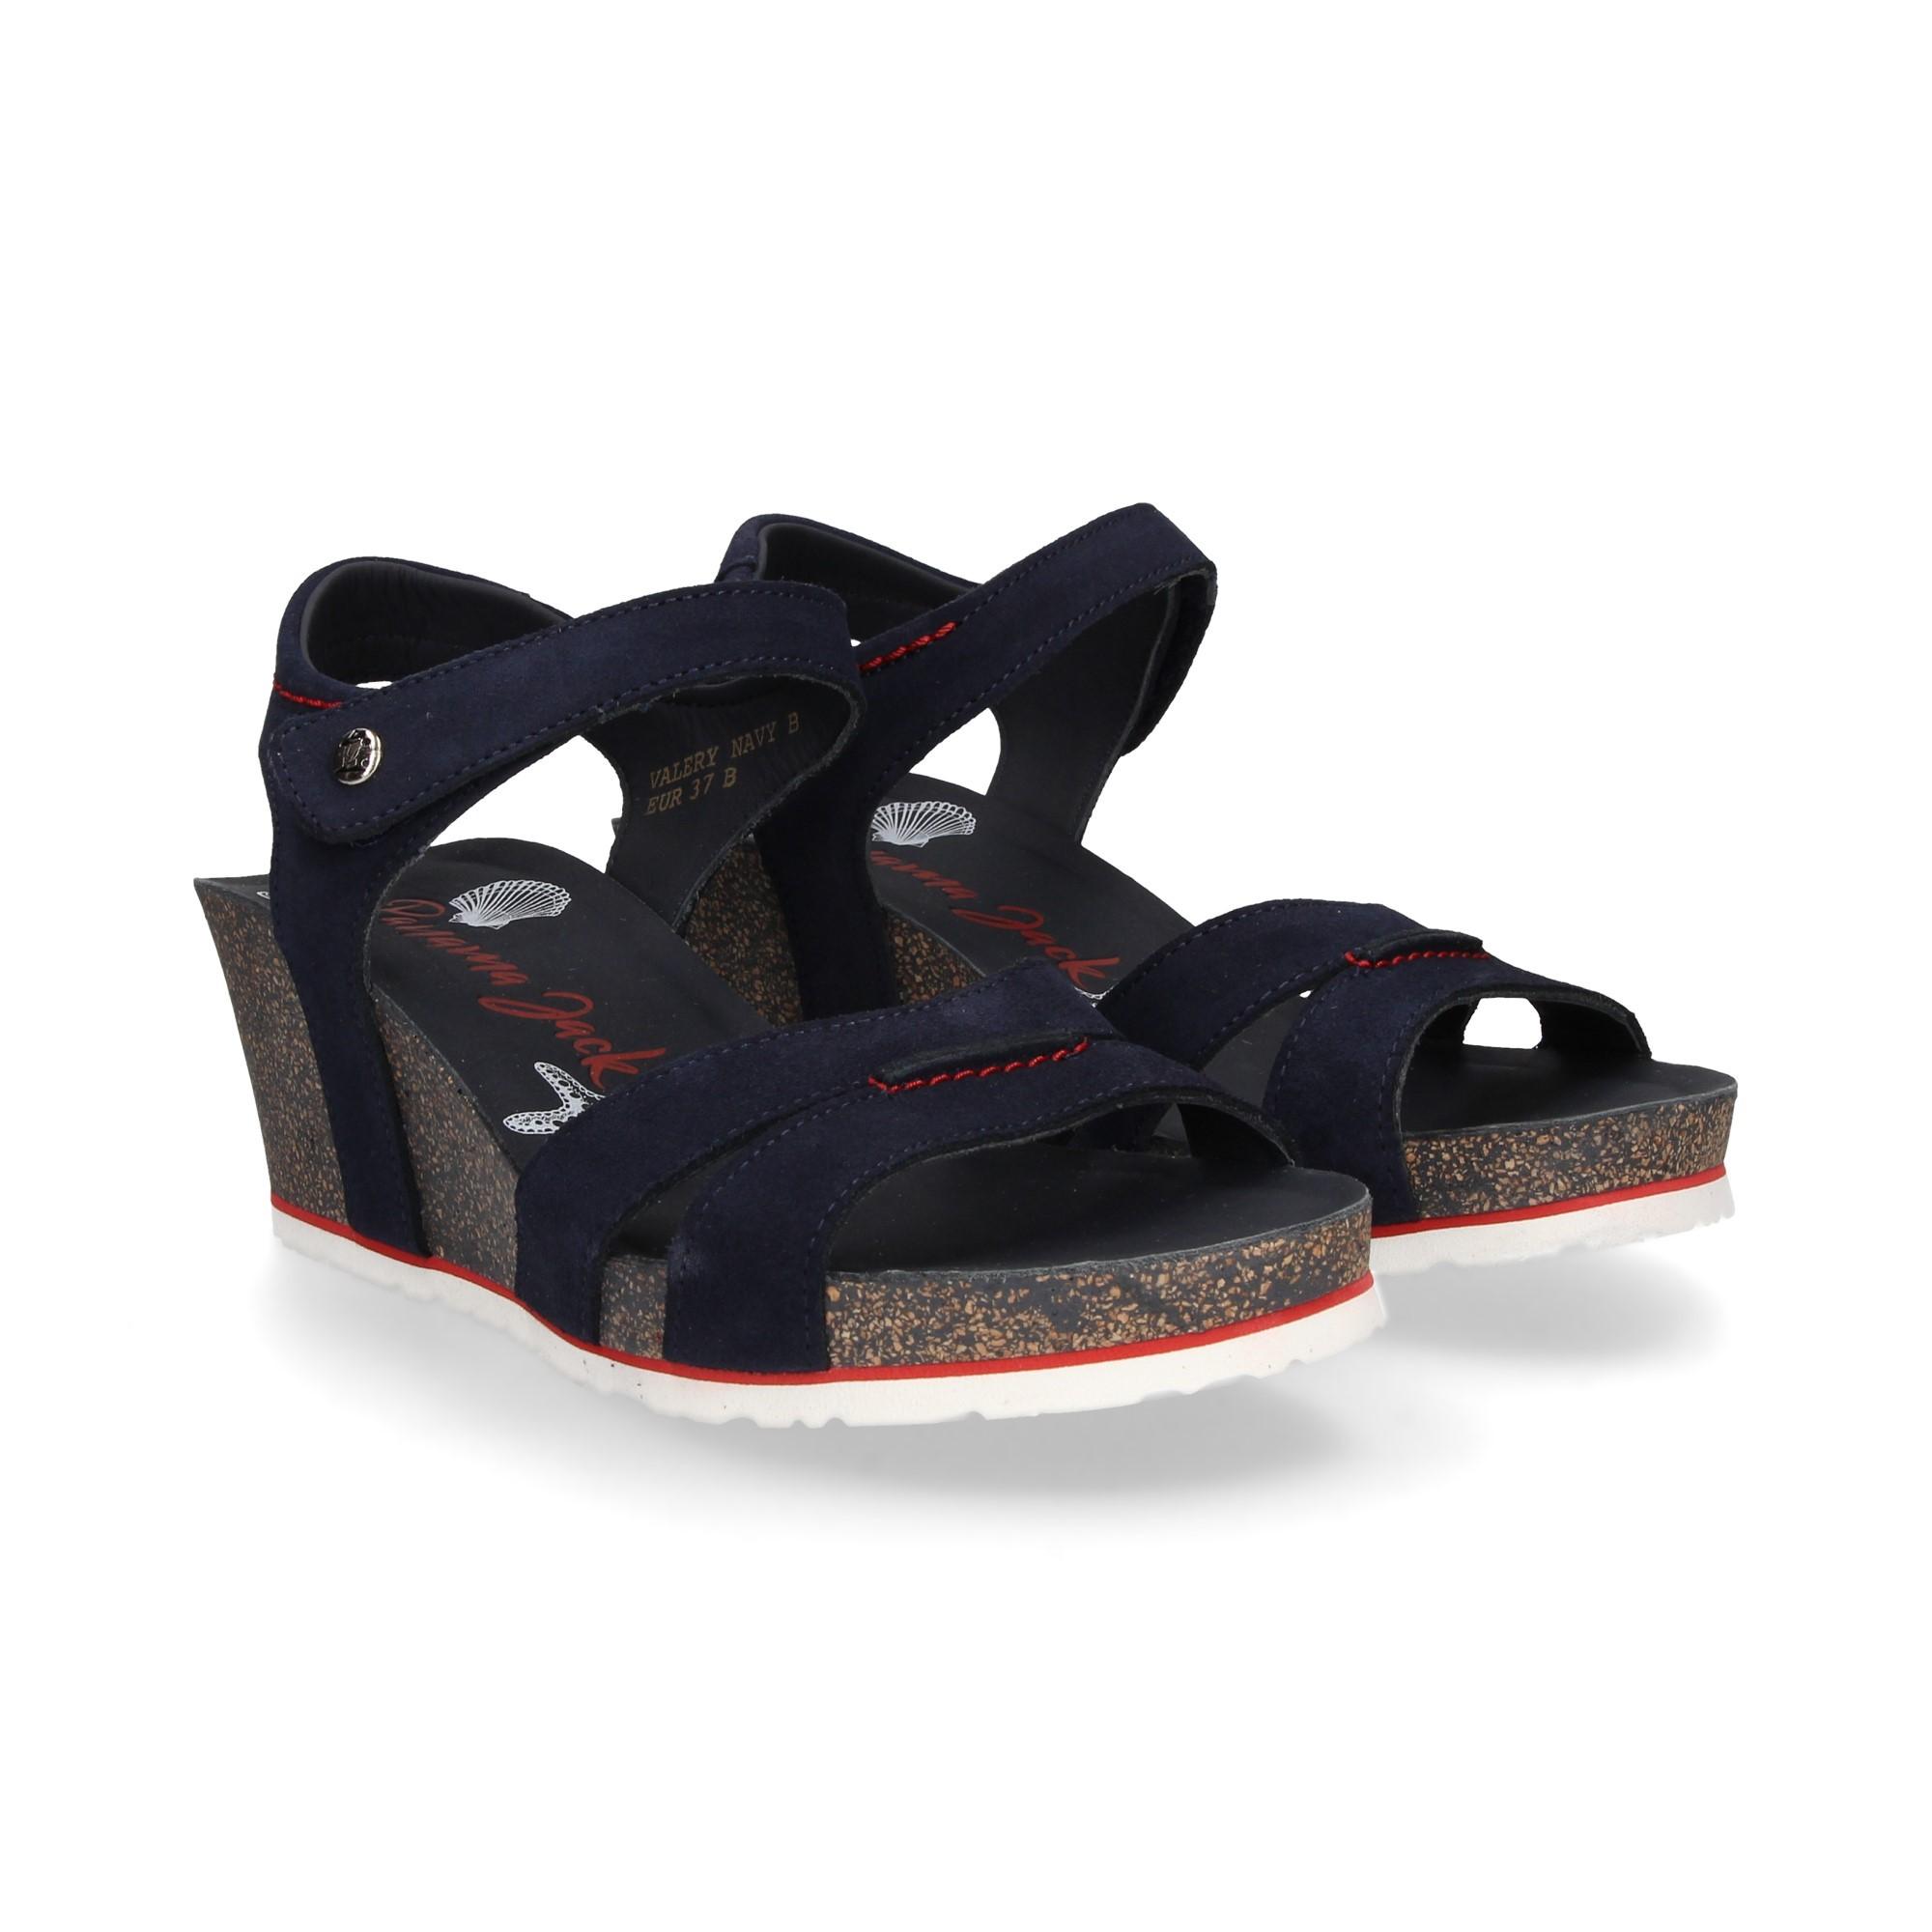 9f3b3d05b69a73 PANAMA JACK Women s wedge sandals VALERI MARINO VELOUR